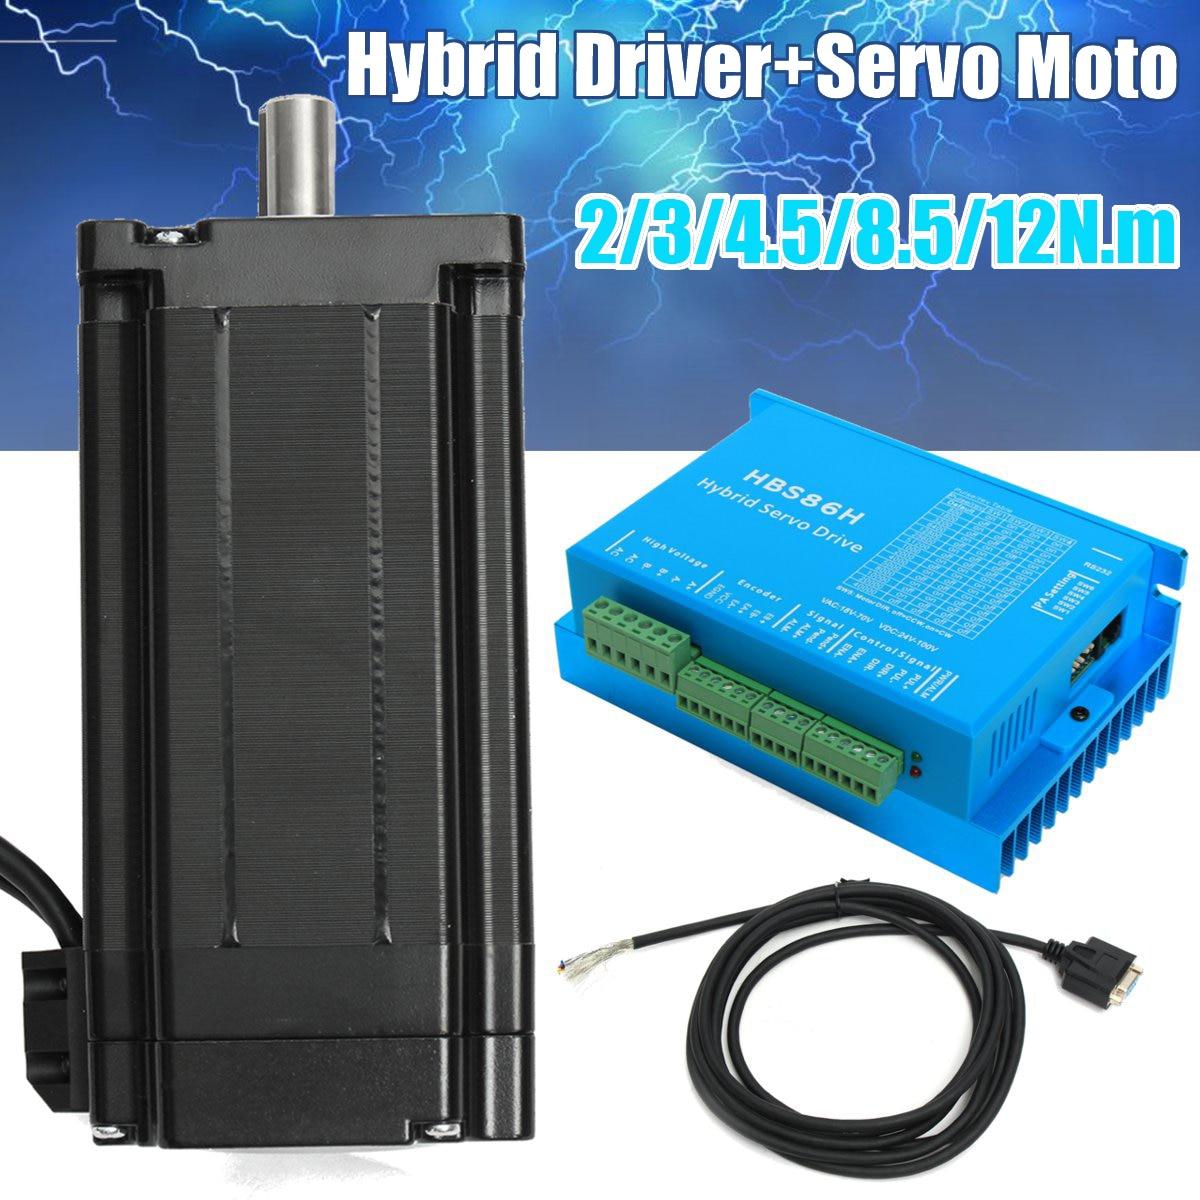 CNC HSS86 Hybrid Driver Servo Stepper Motor 12N.m Closed Loop 86HSE12N-B32